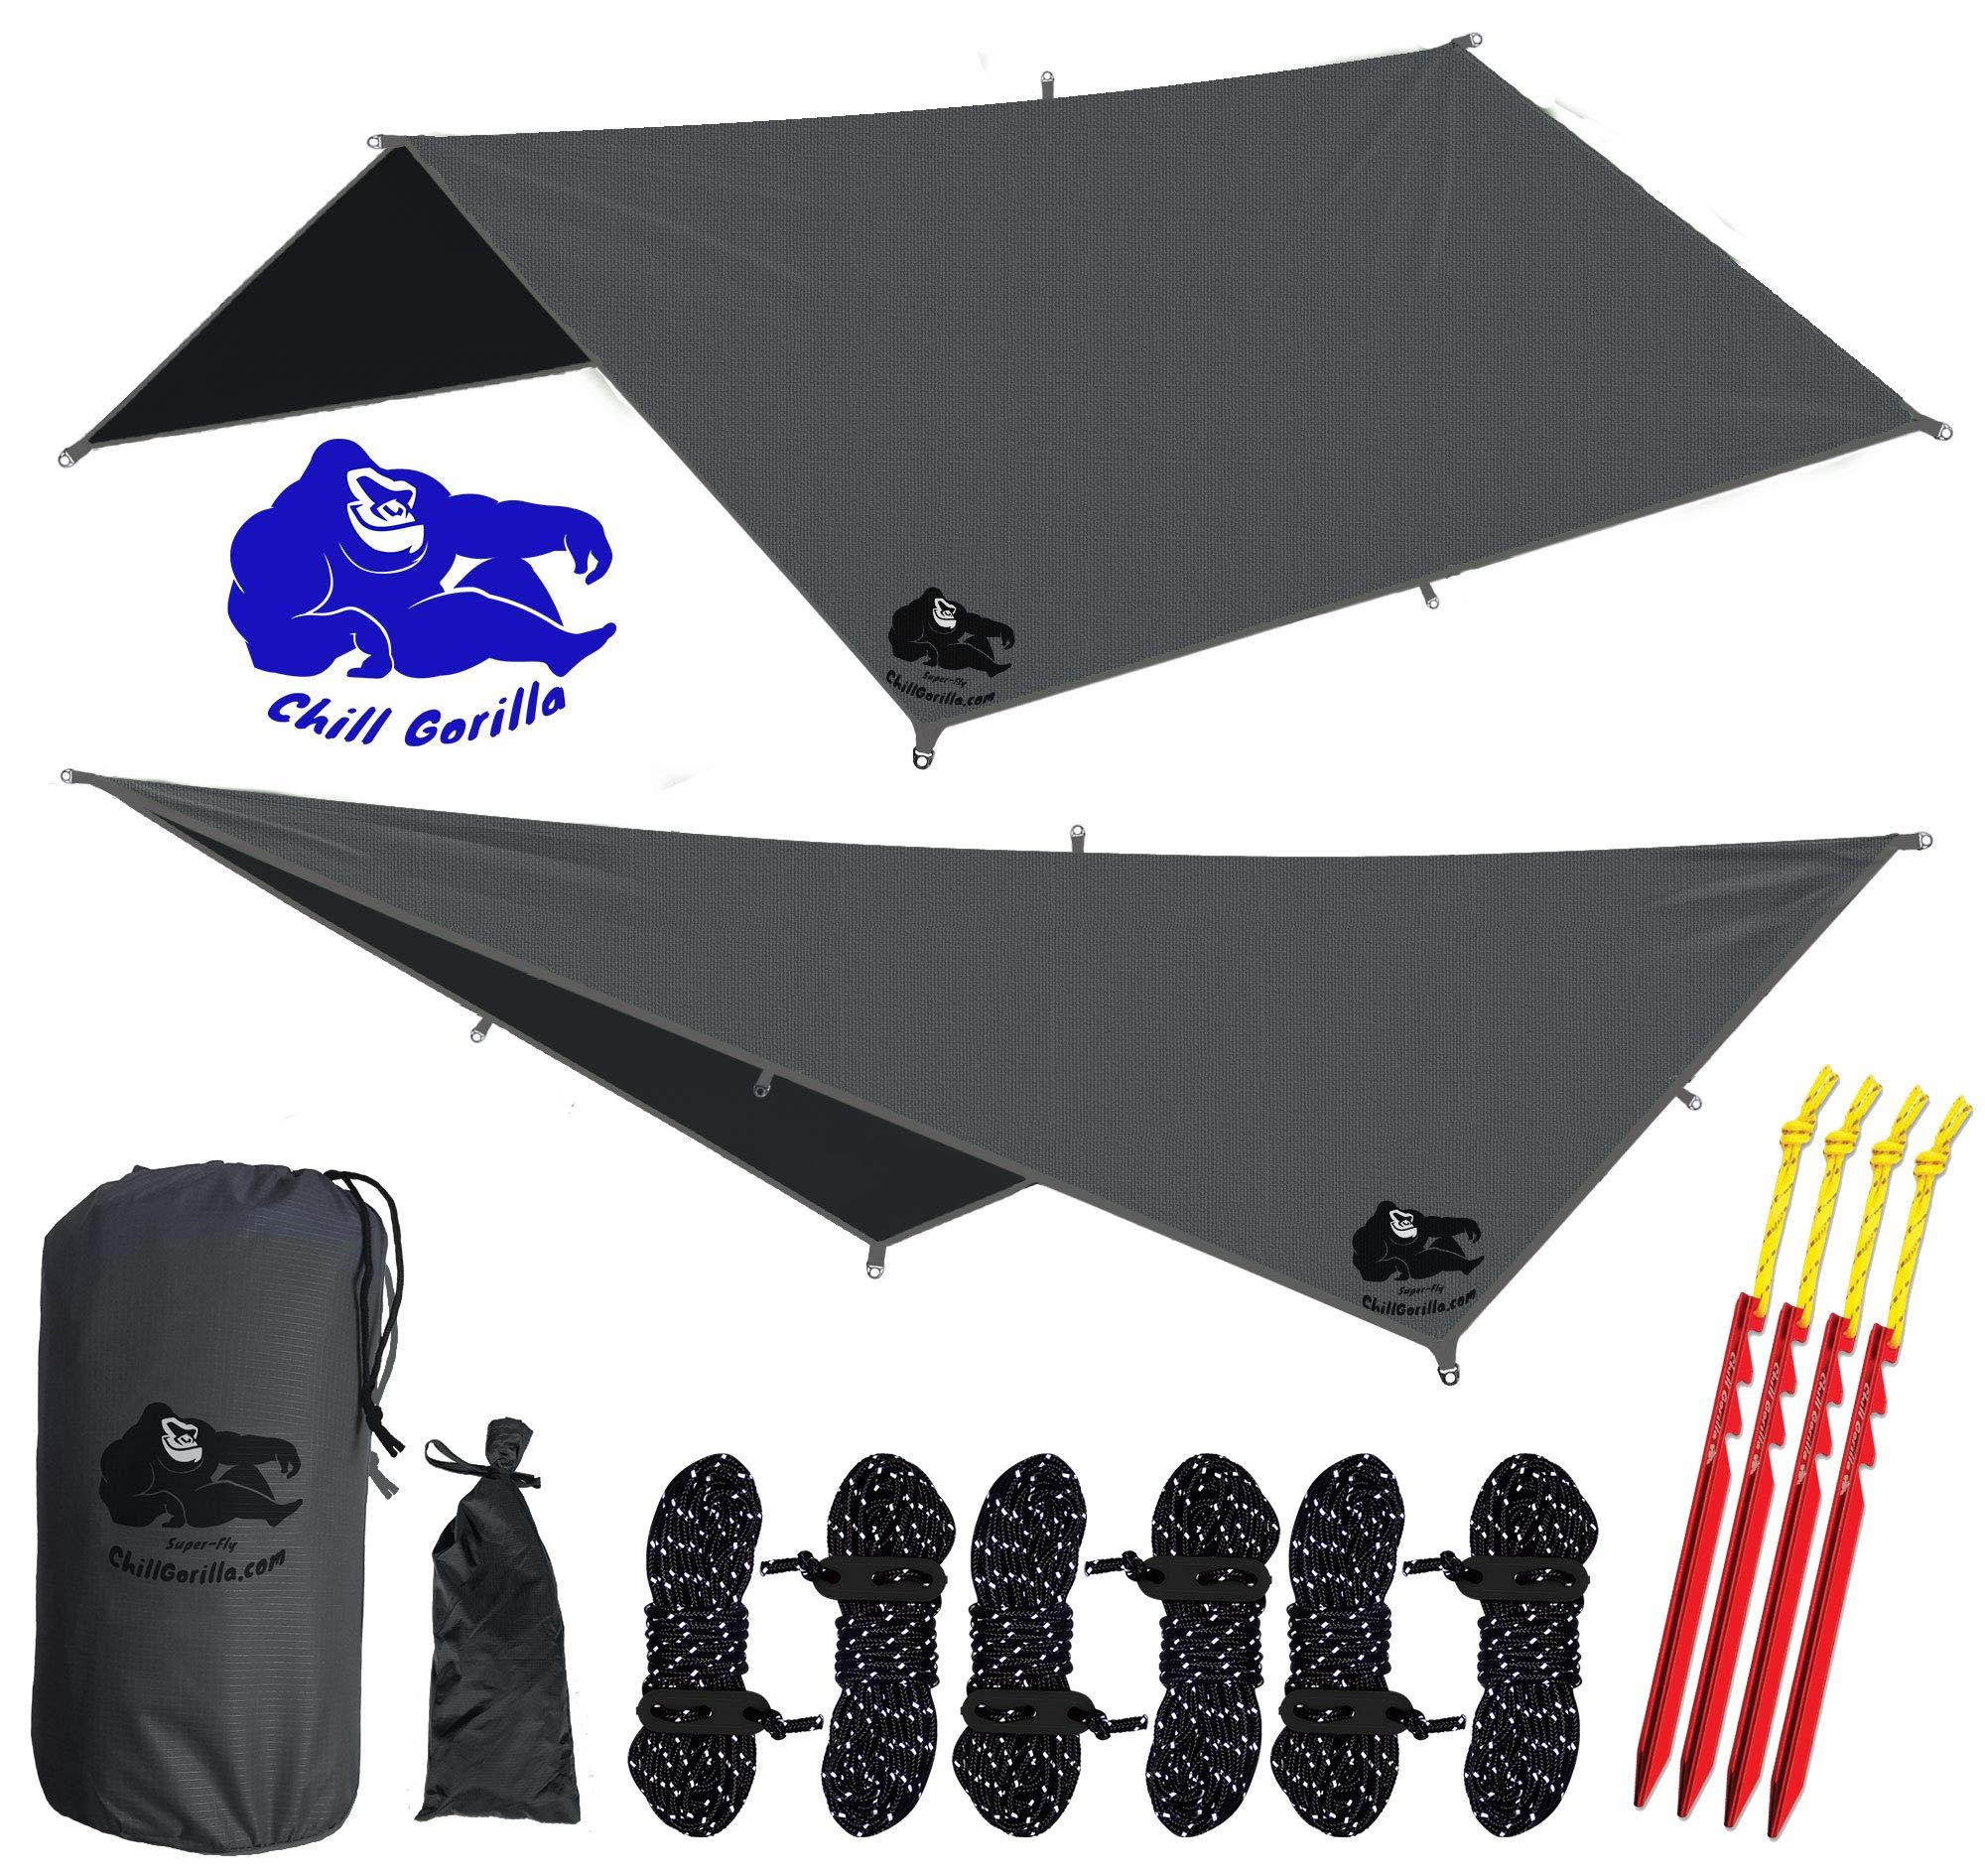 Chill Gorilla 10x10 Hammock Waterproof Rain Fly Tent Tarp 170  Centerline. Ripstop Nylon u0026  sc 1 st  Amazon.com & Tarp Tents: Amazon.com